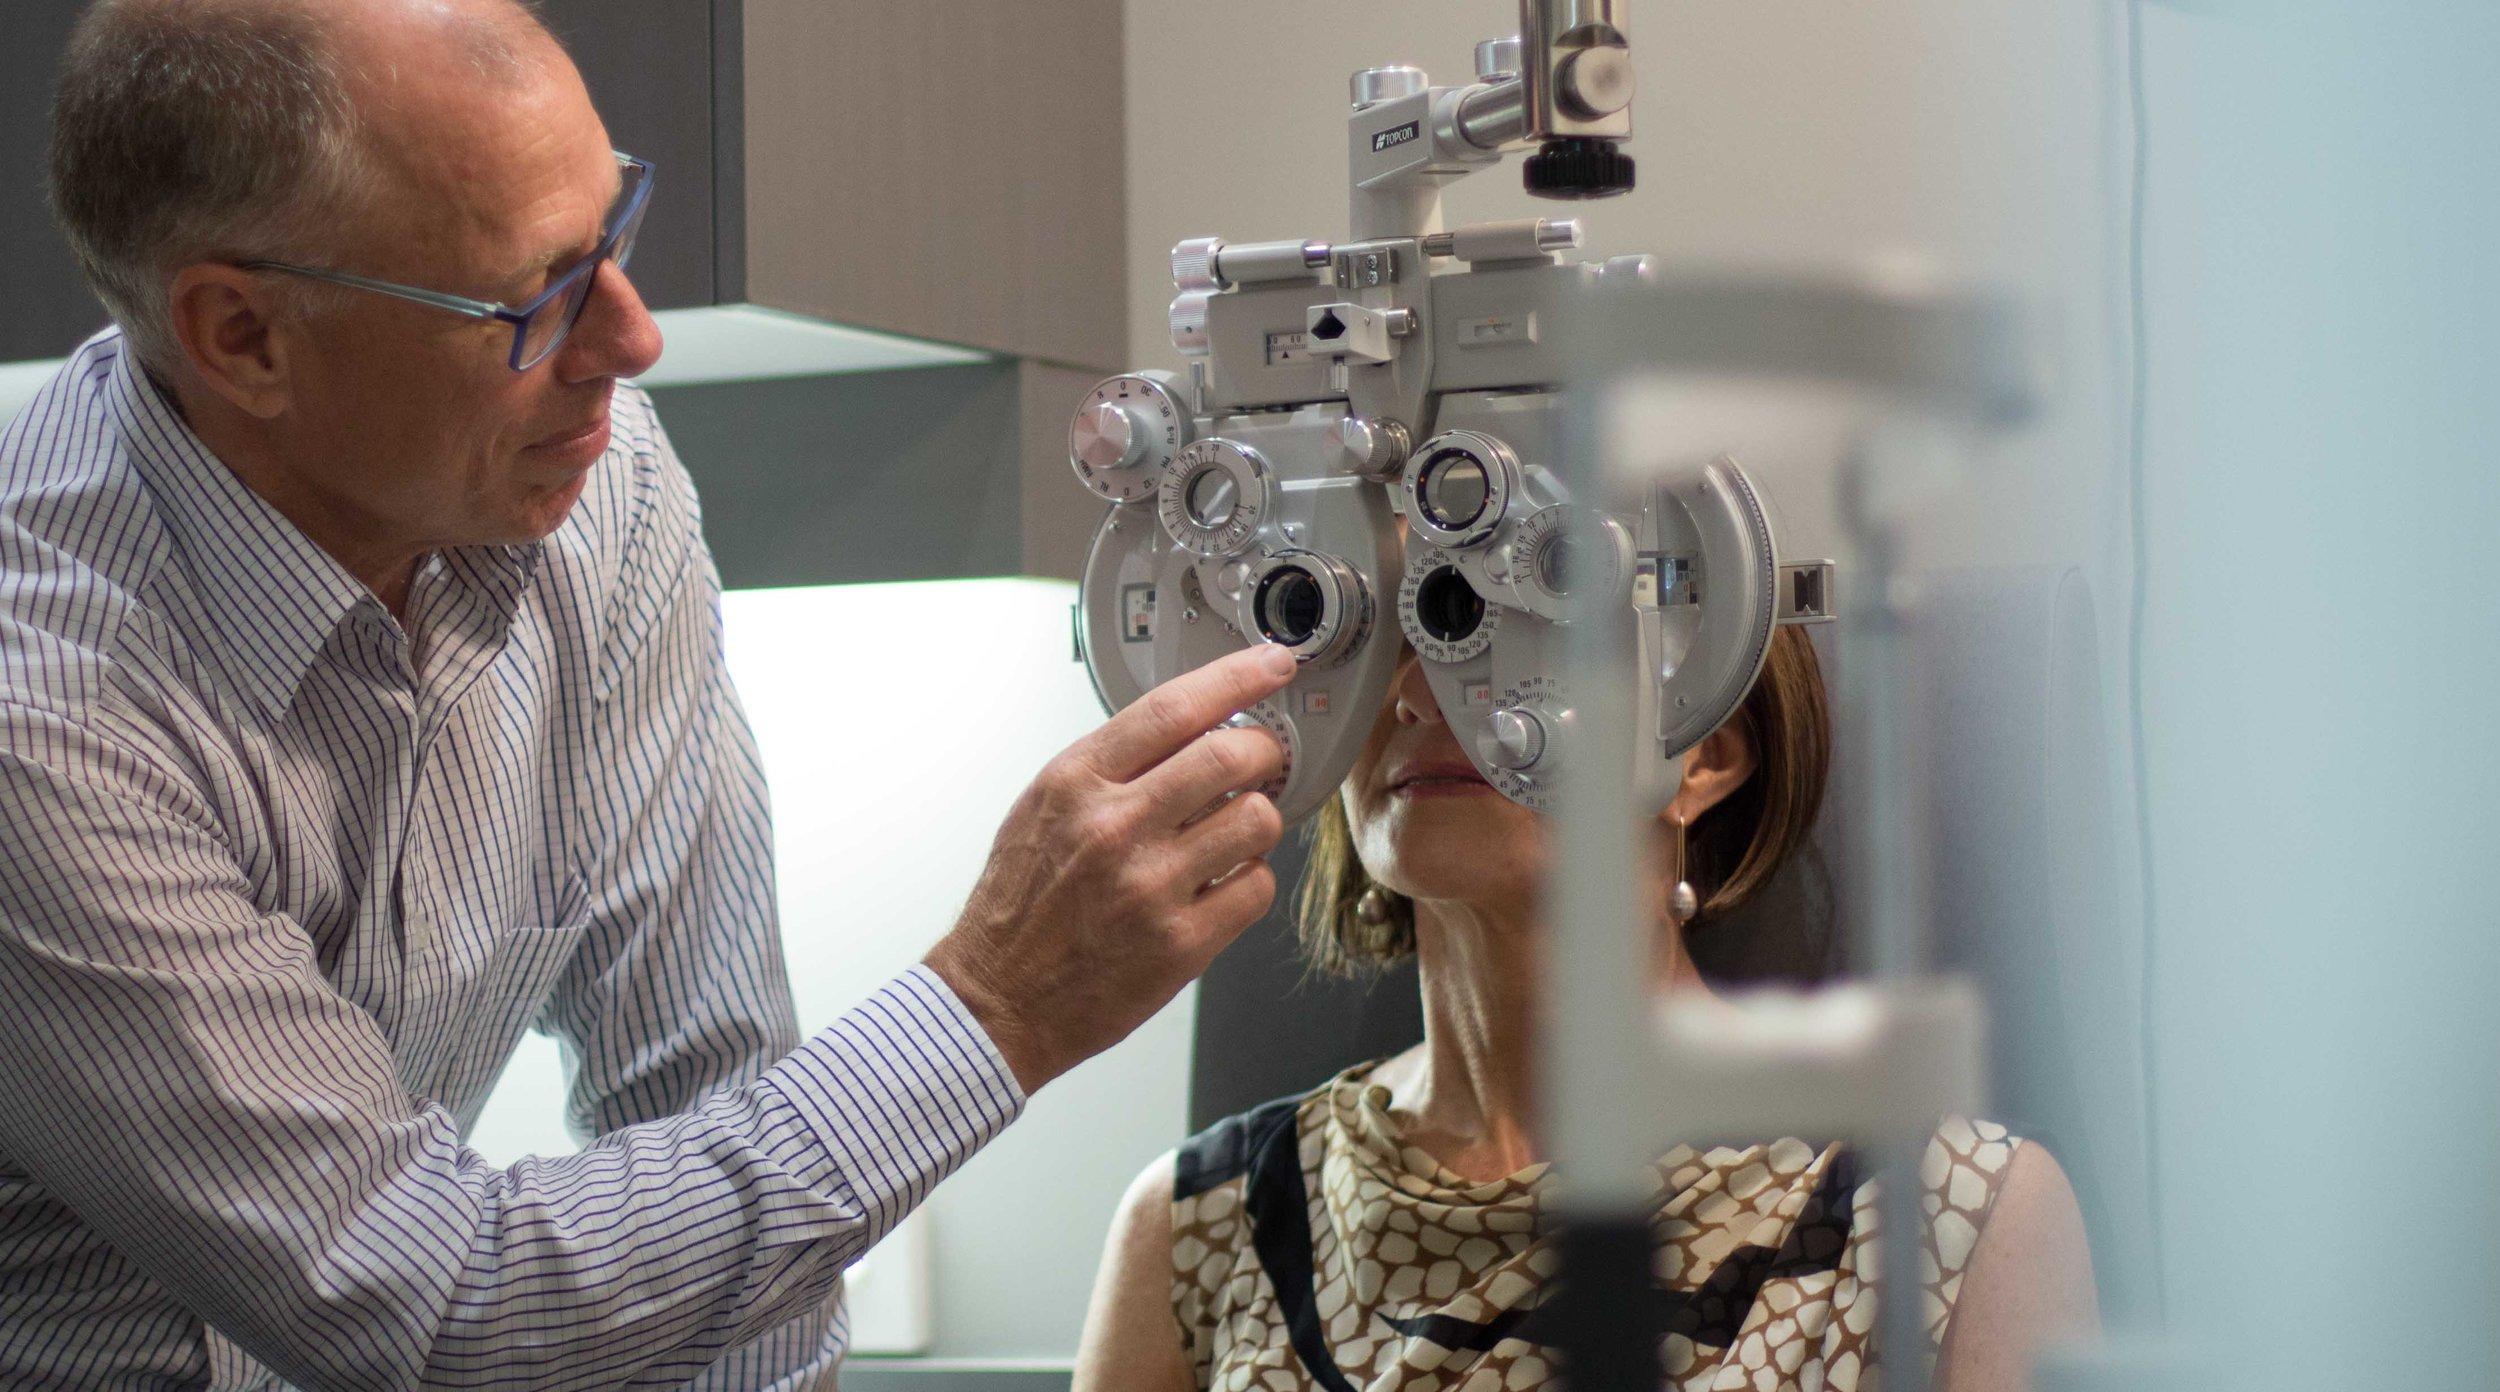 ICO_eye_inspection_machine-3.jpg